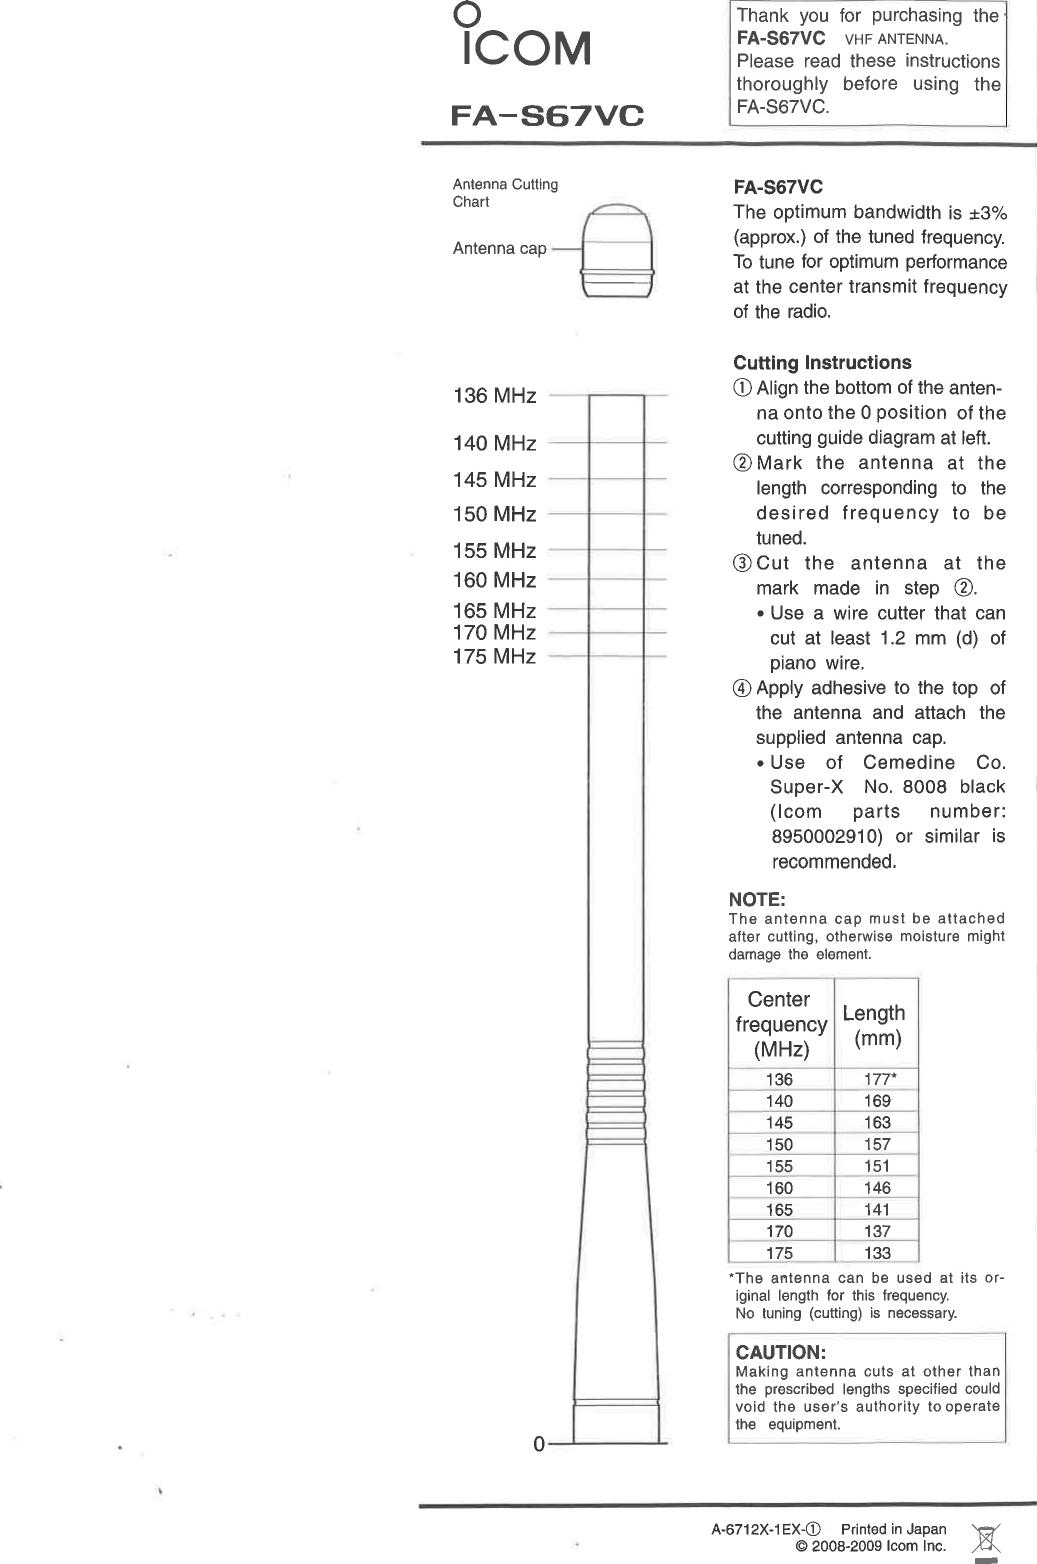 ICOM orporated 376600 VHF Digital Transceiver User Manual 2